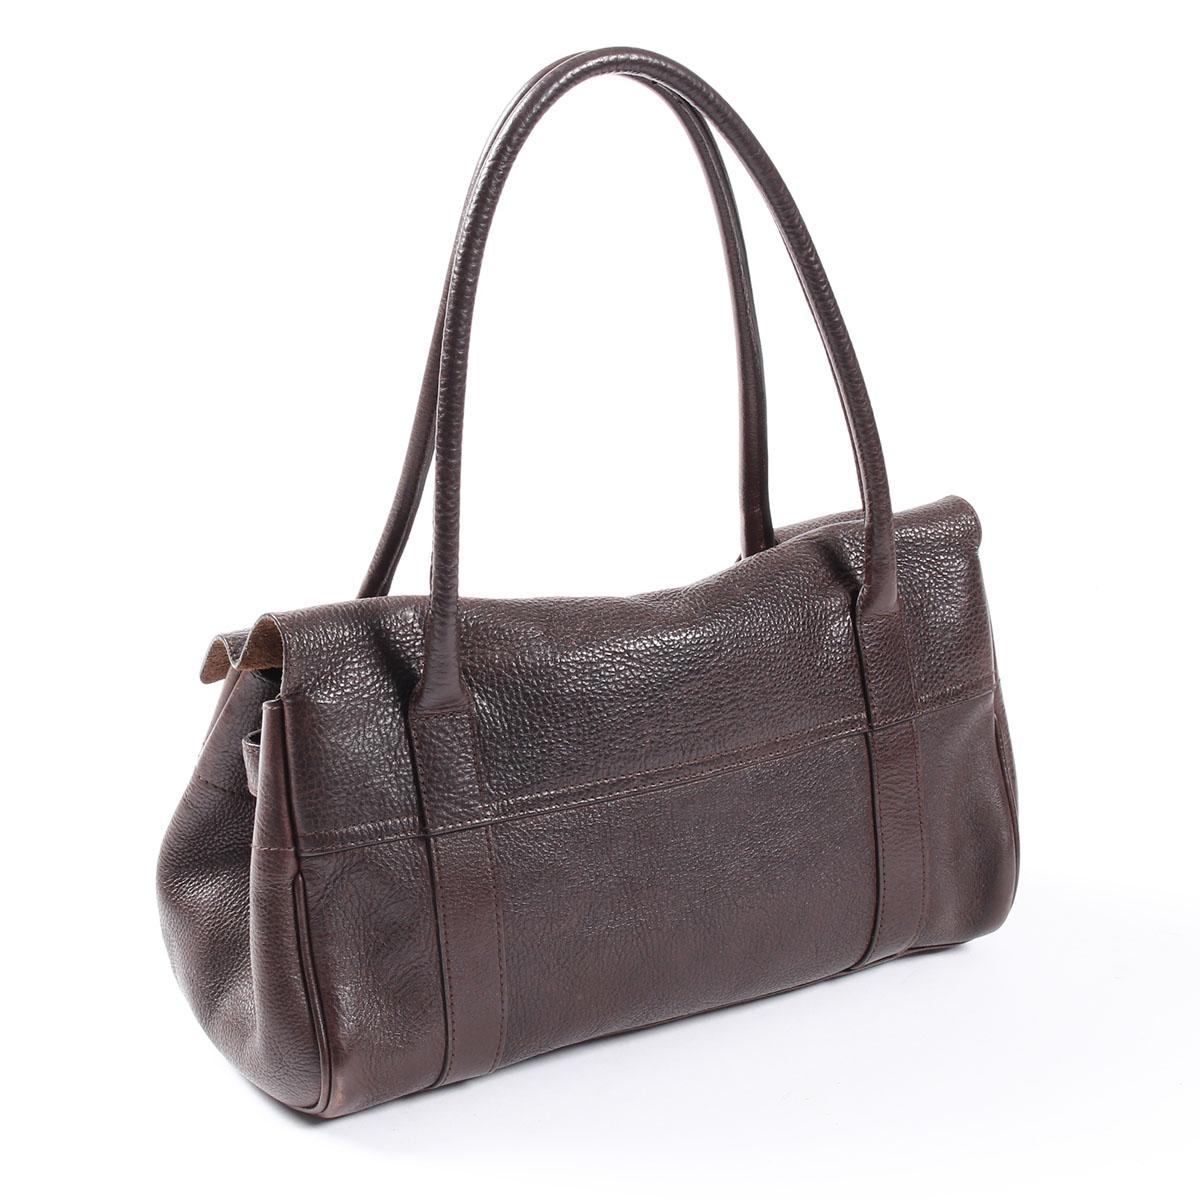 1dda2efca2f3 ... greece mulberry bag model bayswater 6ee20 f51d5